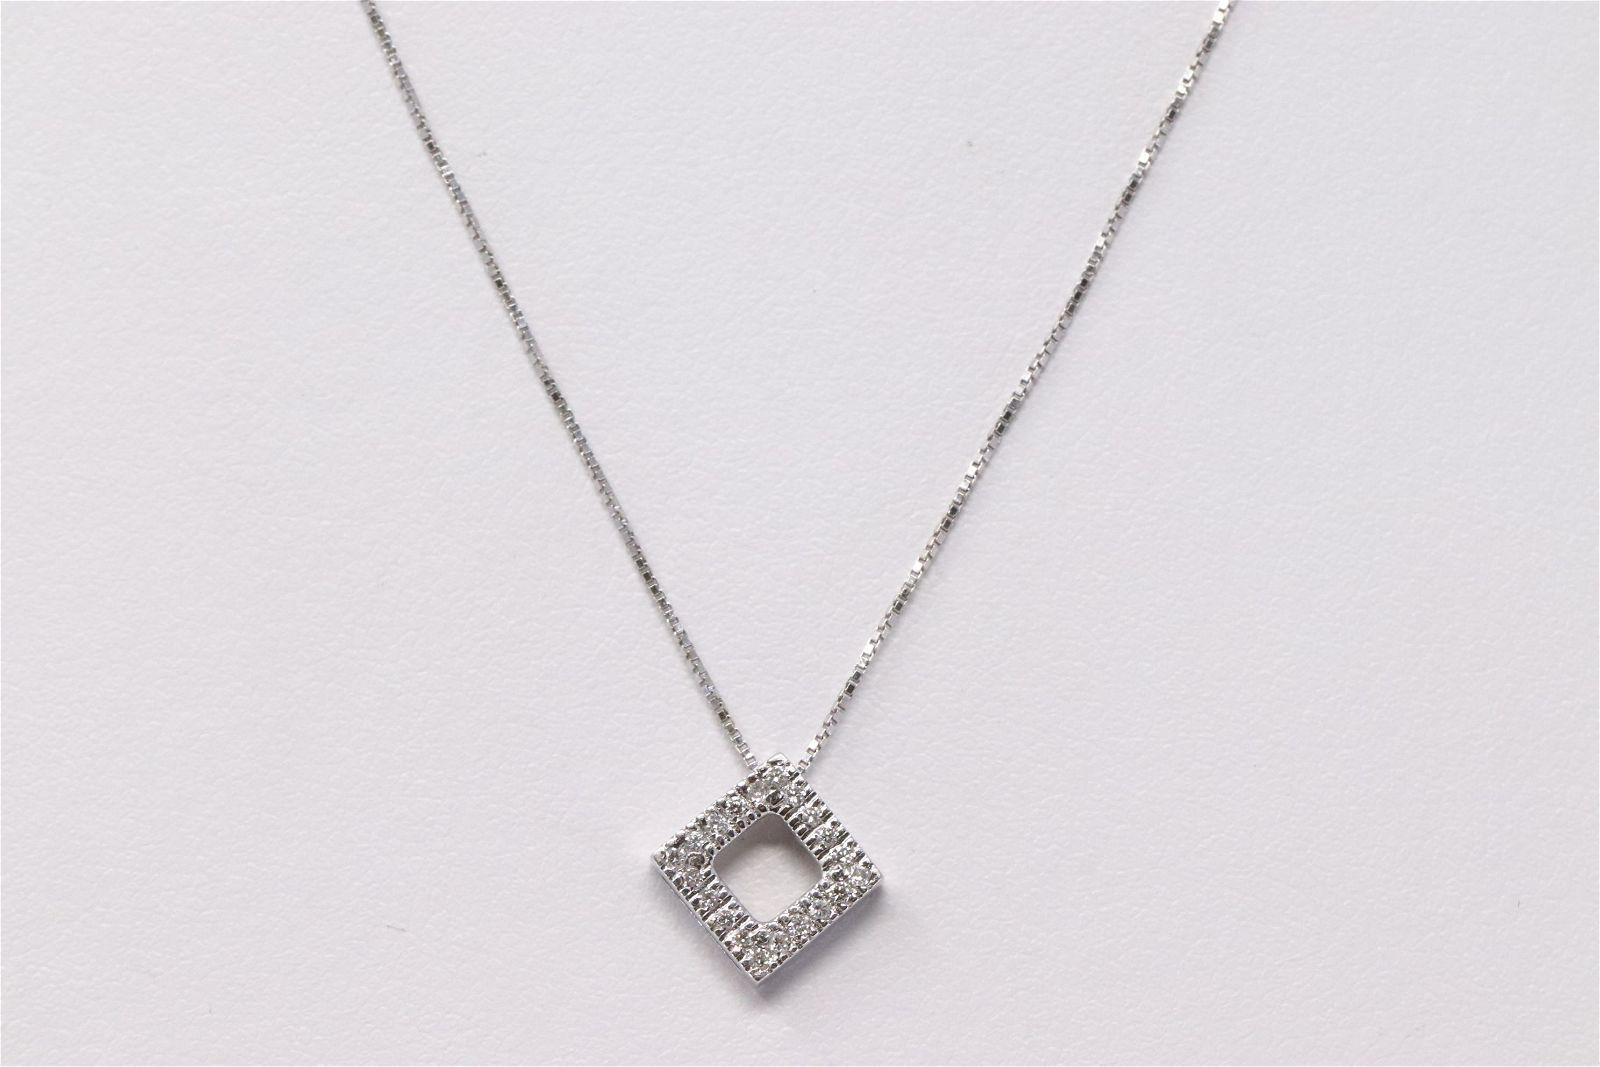 14Kt White Gold Diamond Pendant.